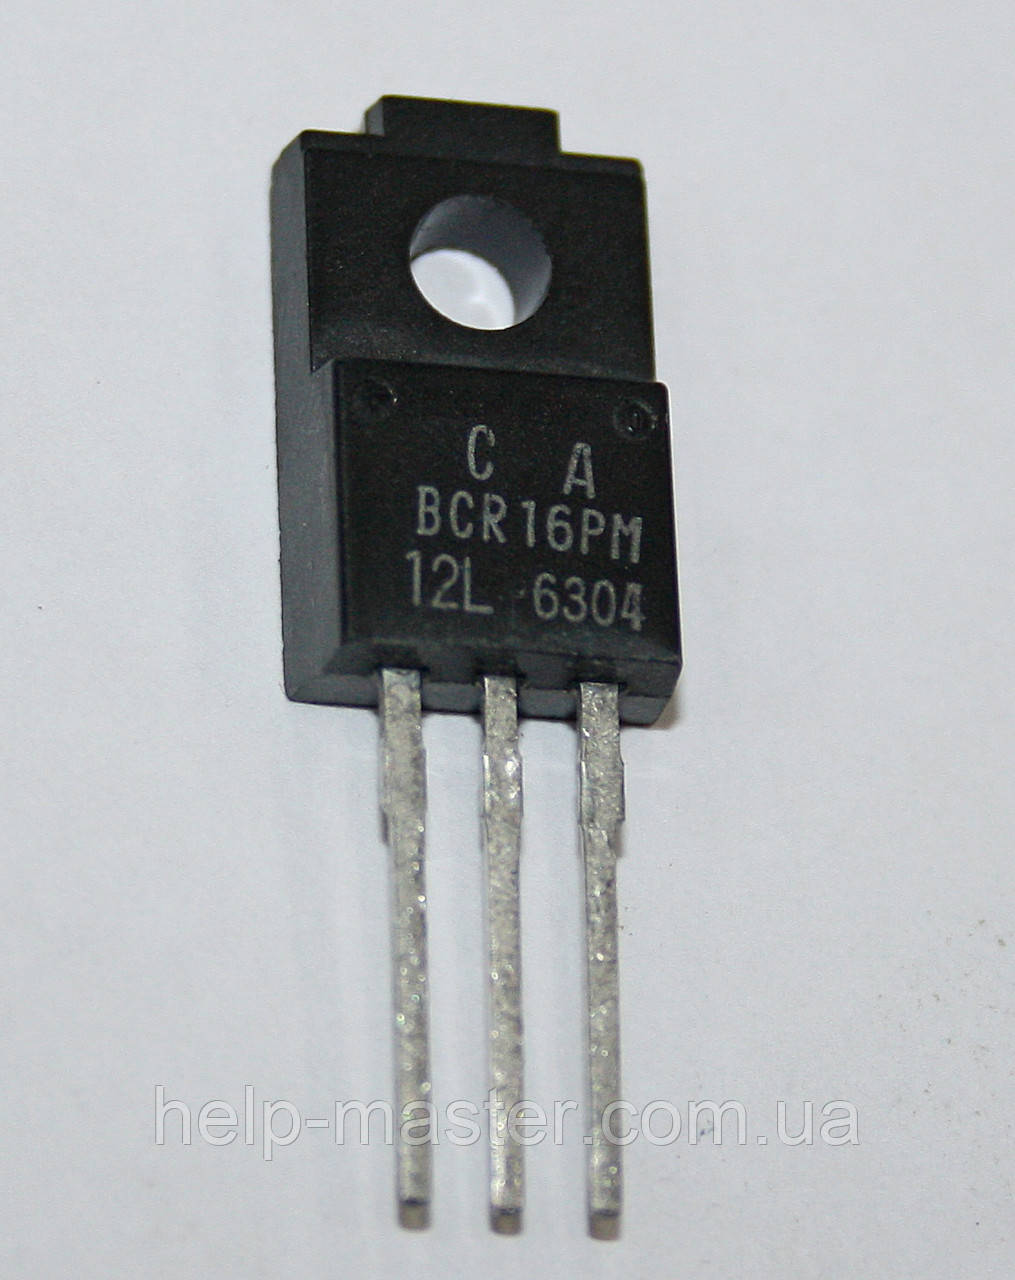 Симистор BCR16PM-12LC (TO-220F)